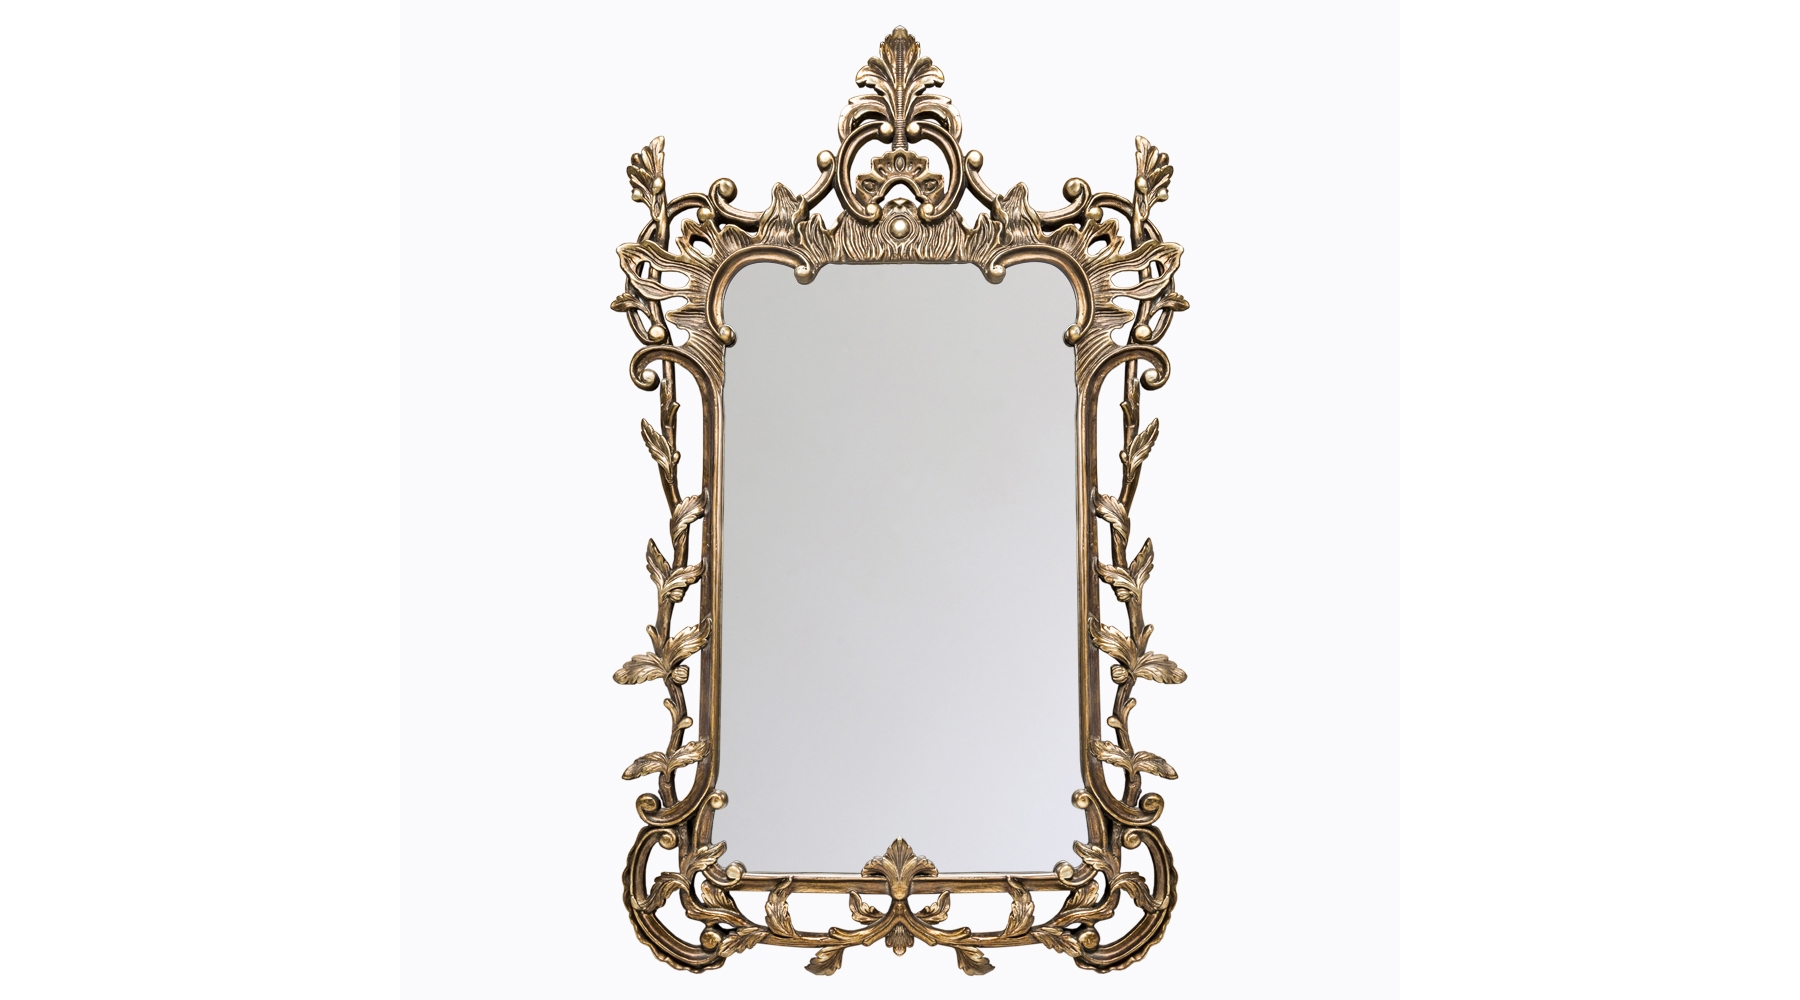 Object Desire Настенное зеркало «Мирей»